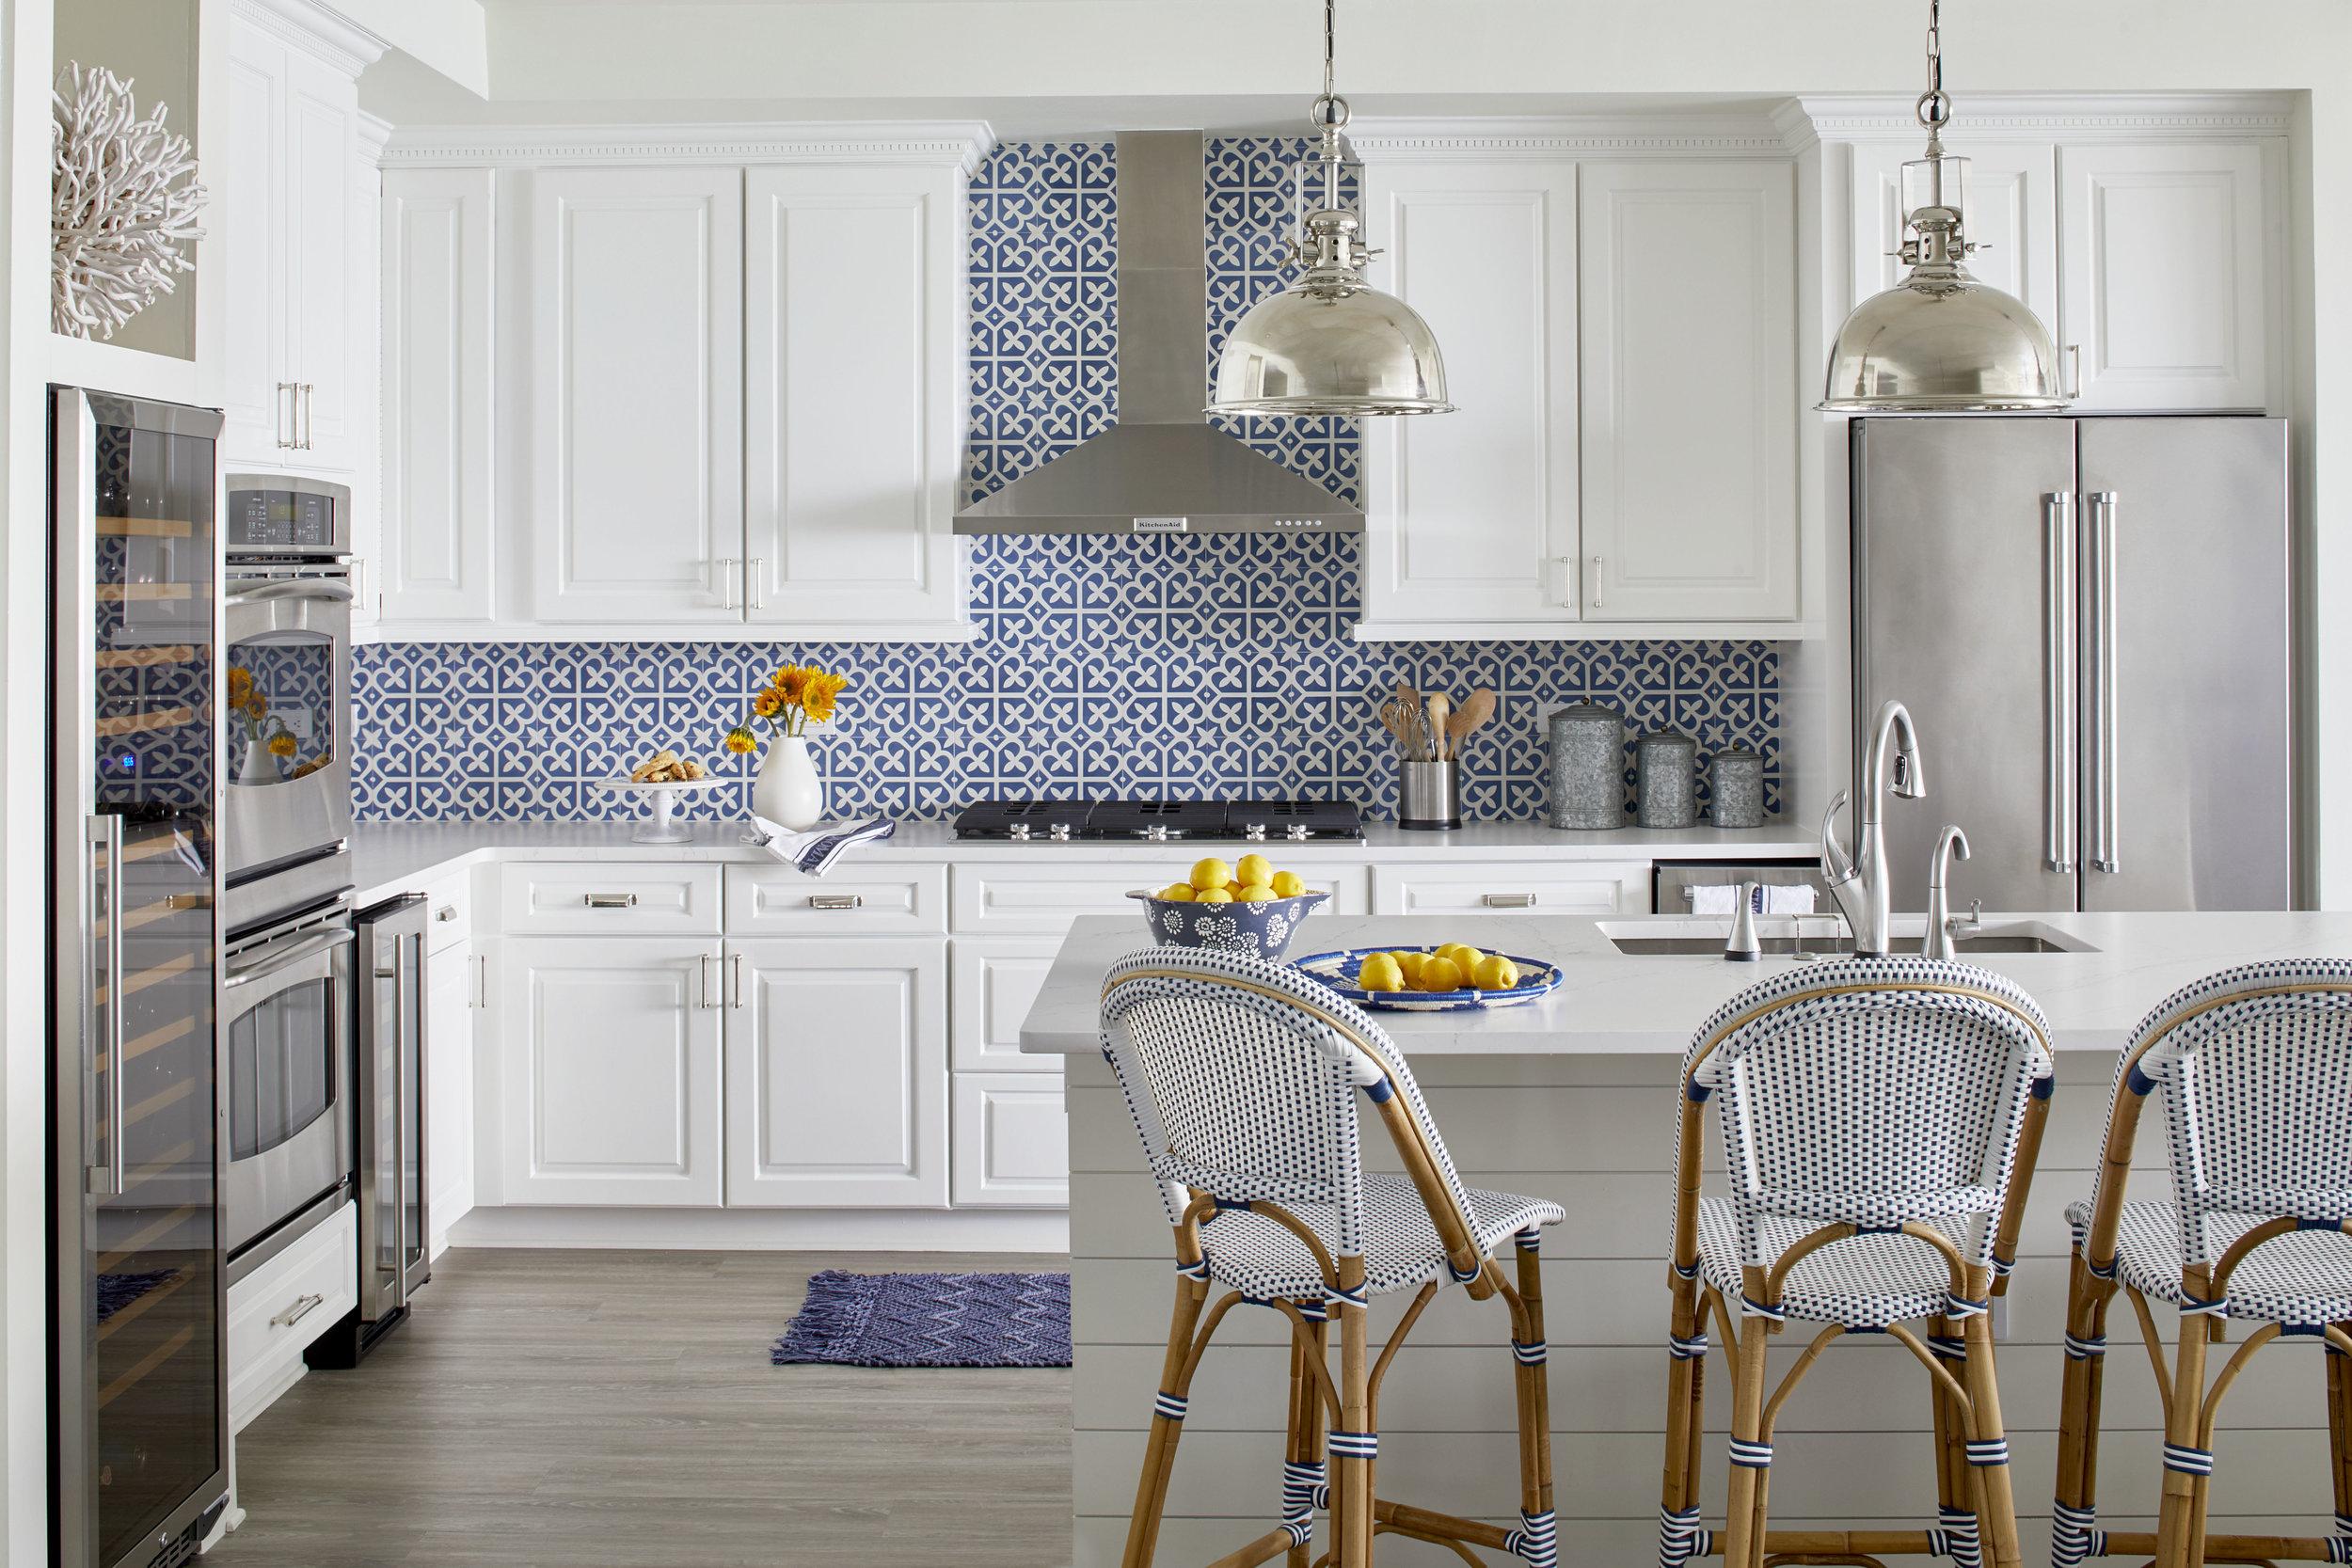 Gabrielson_BocianBeachHouse_Kitchen.jpg